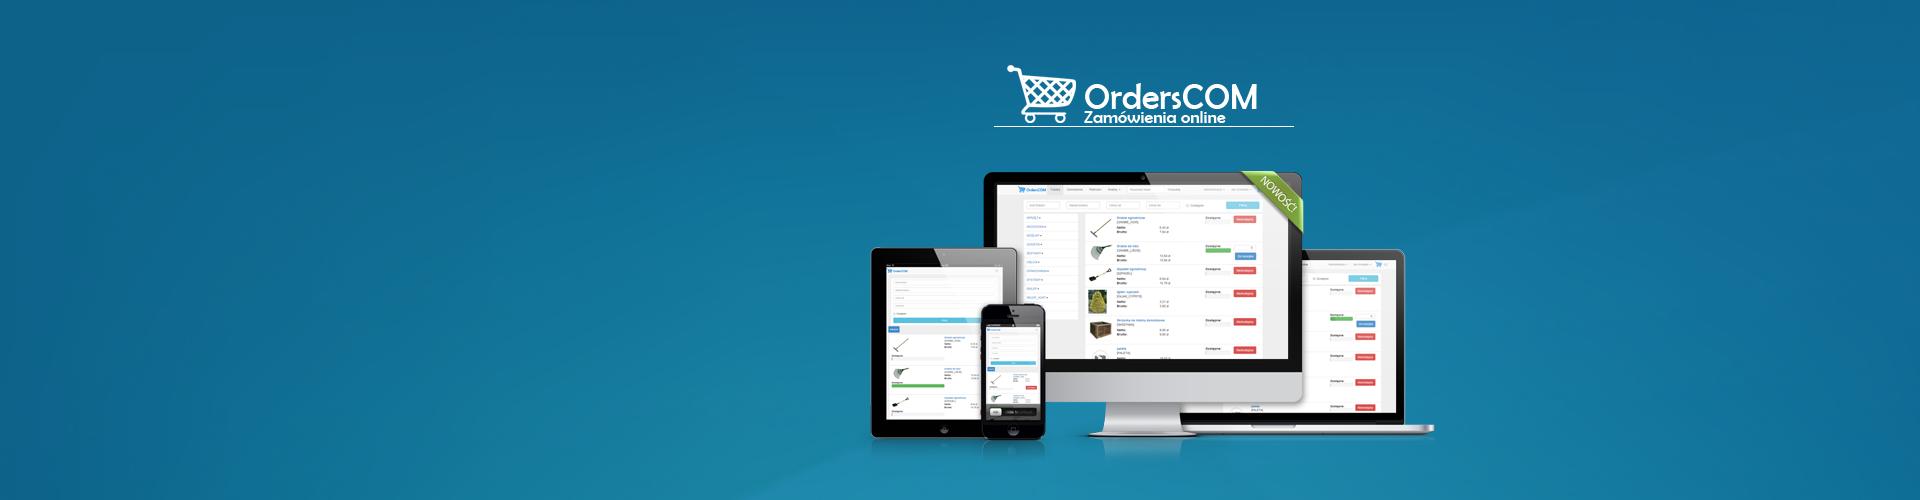 slider_orderscom